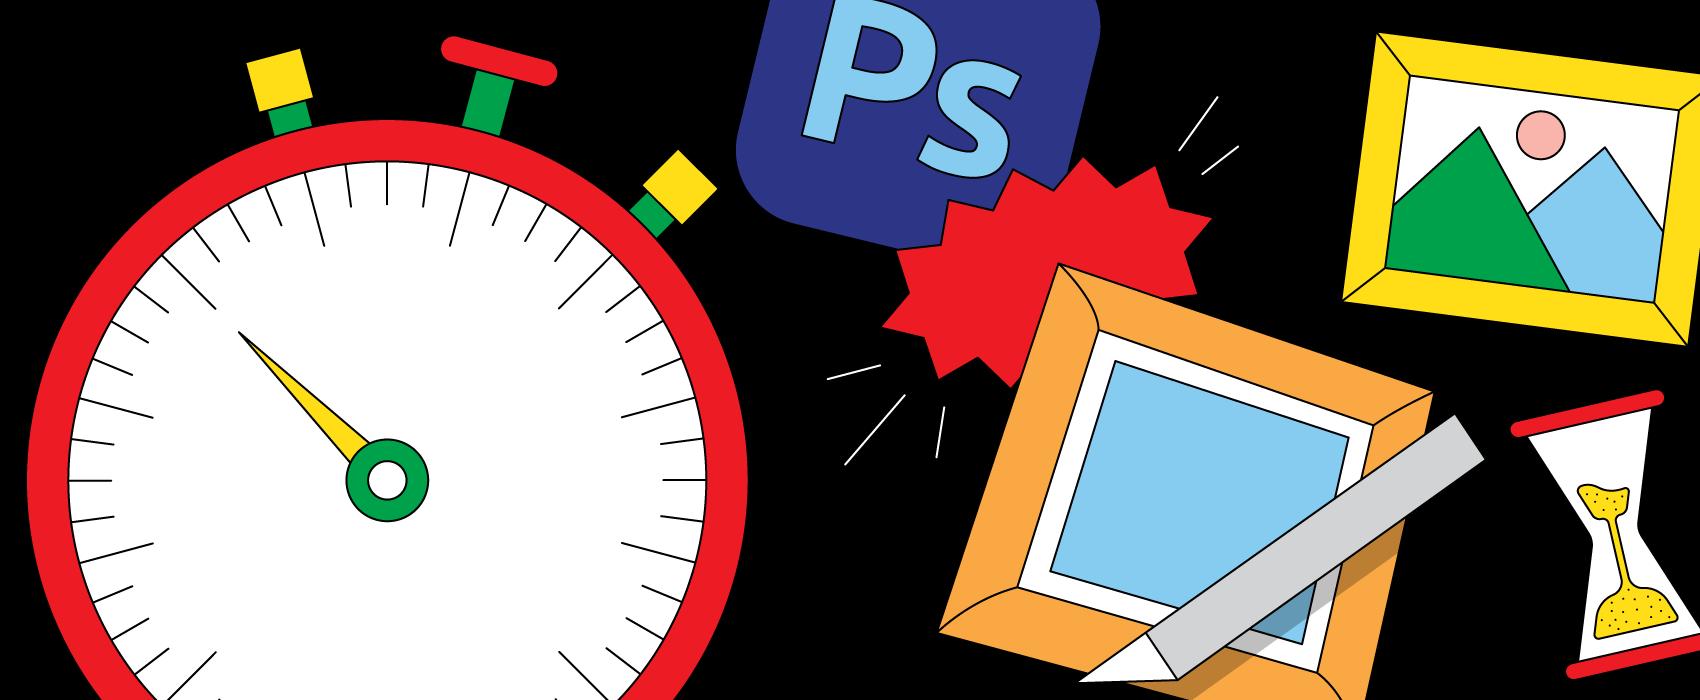 Time efficiency between Photoshop and ImageFramer digital framing apps